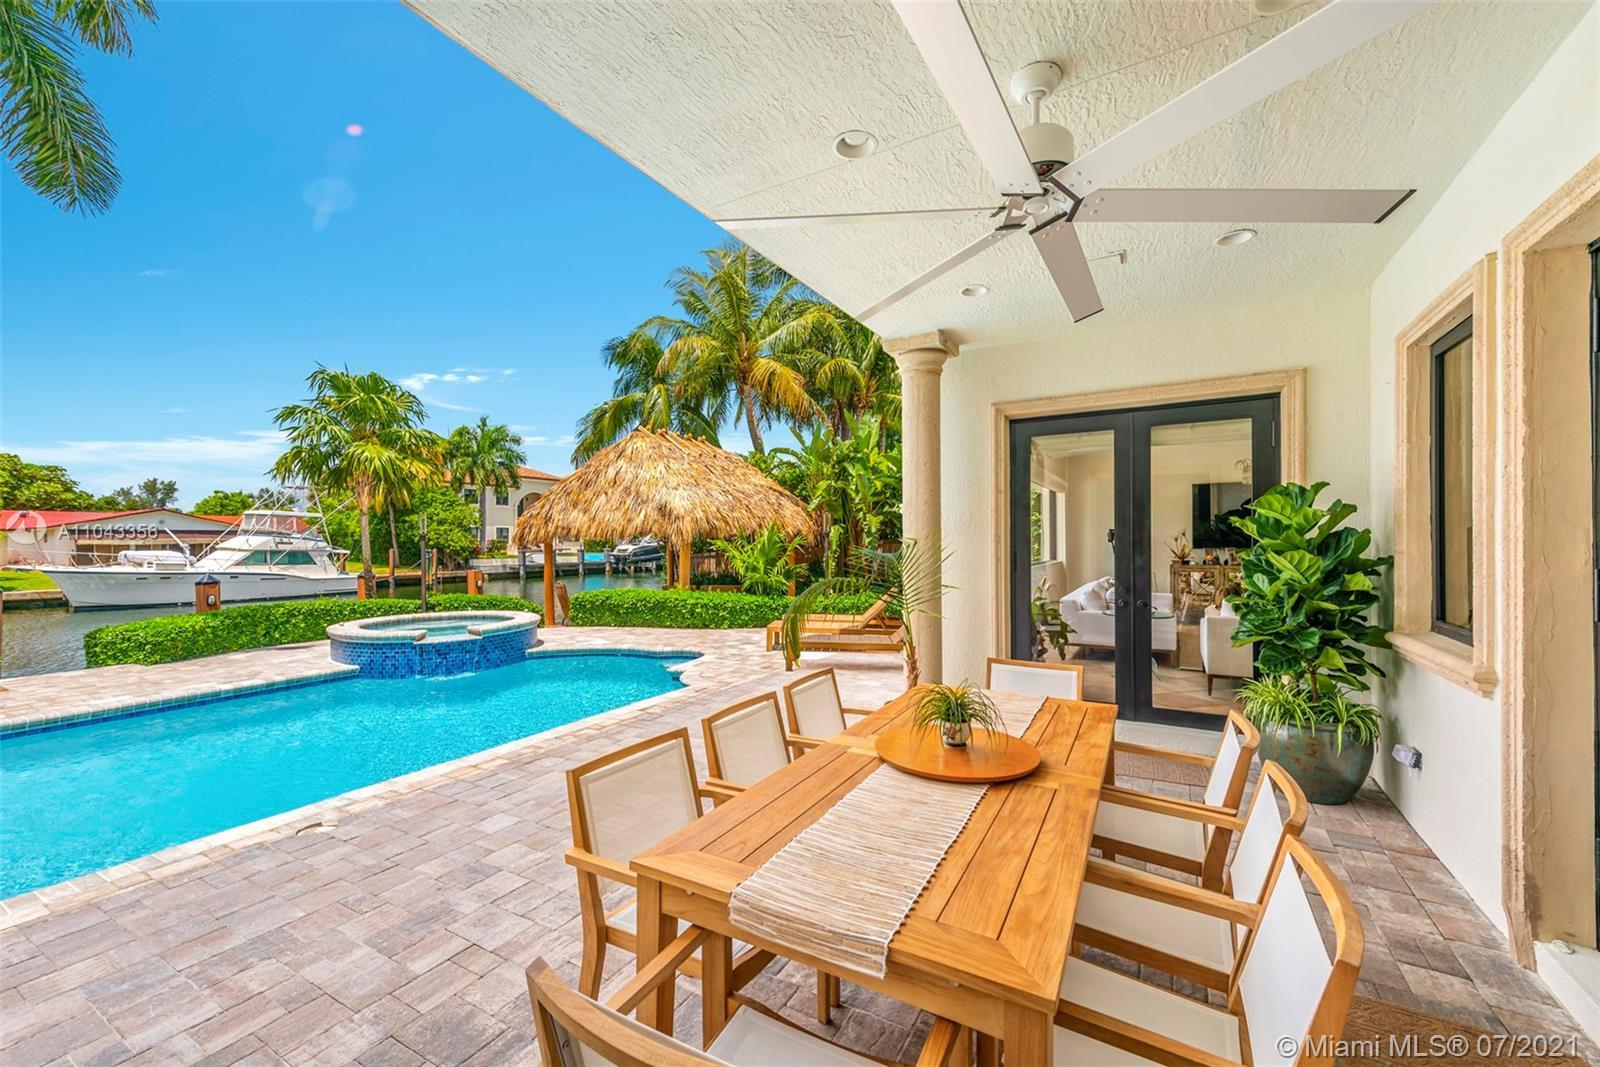 636 PALM DRIVE, Hallandale Beach, Florida 33009